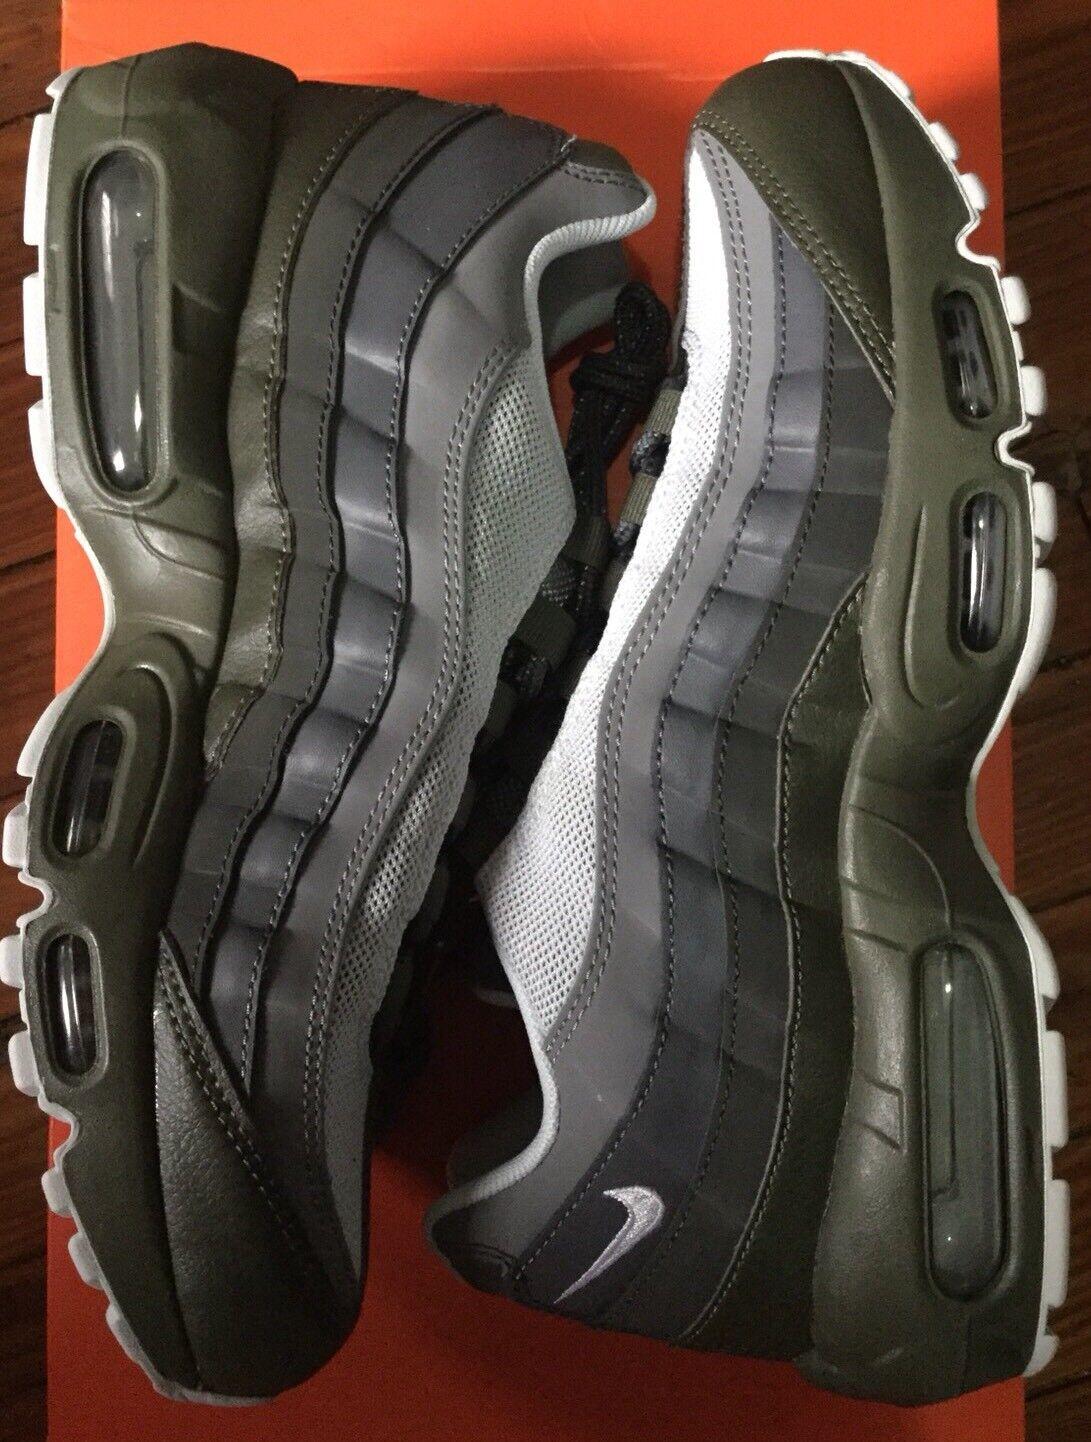 Nike Mens Air Max 95 Essential 749766 302 Size 8.5 Cargo Khaki Olive